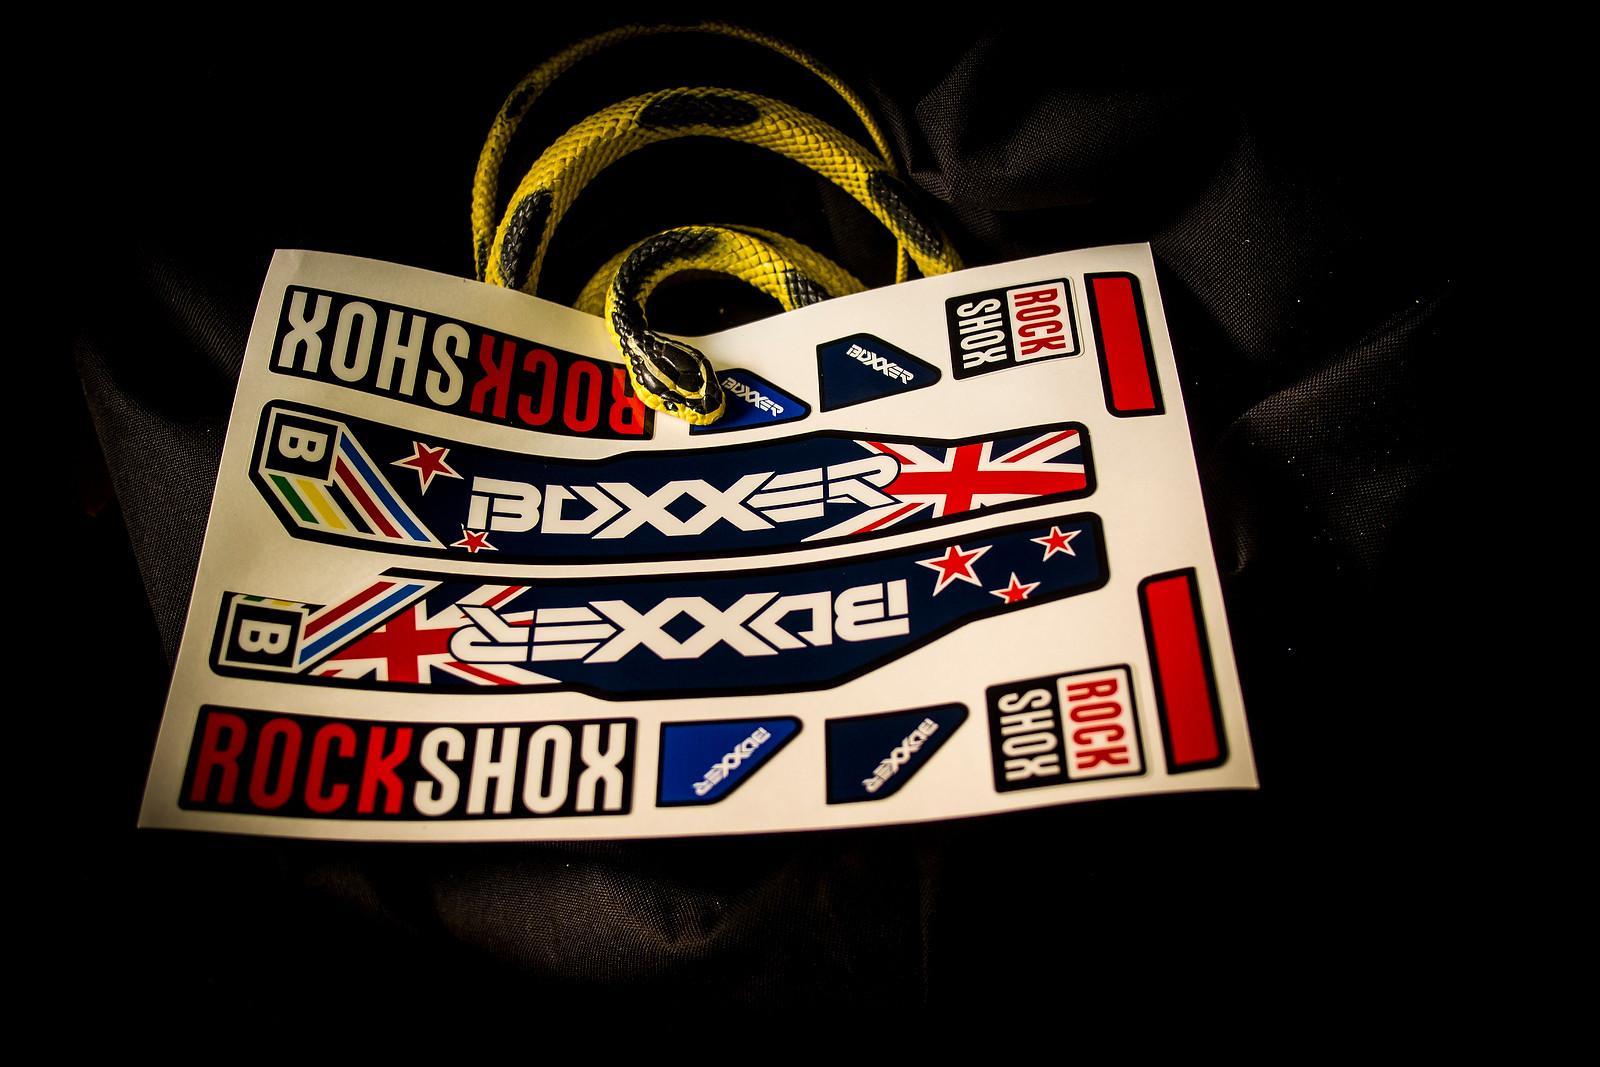 Sam Blenkinsop's BoXXer Decals - World Championships Bikes and Gear 2013 - Mountain Biking Pictures - Vital MTB